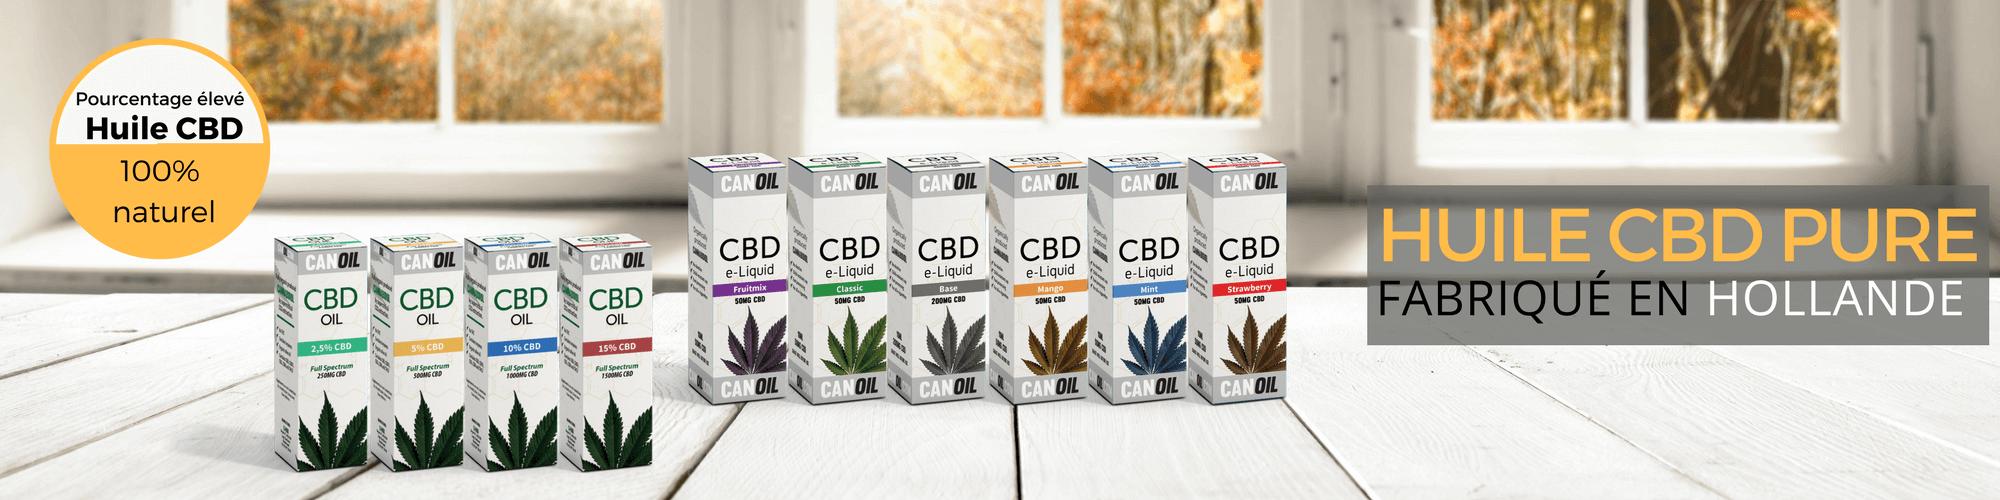 Fabricant de CBD CBD Oil et CBD E-Liquids banner 2